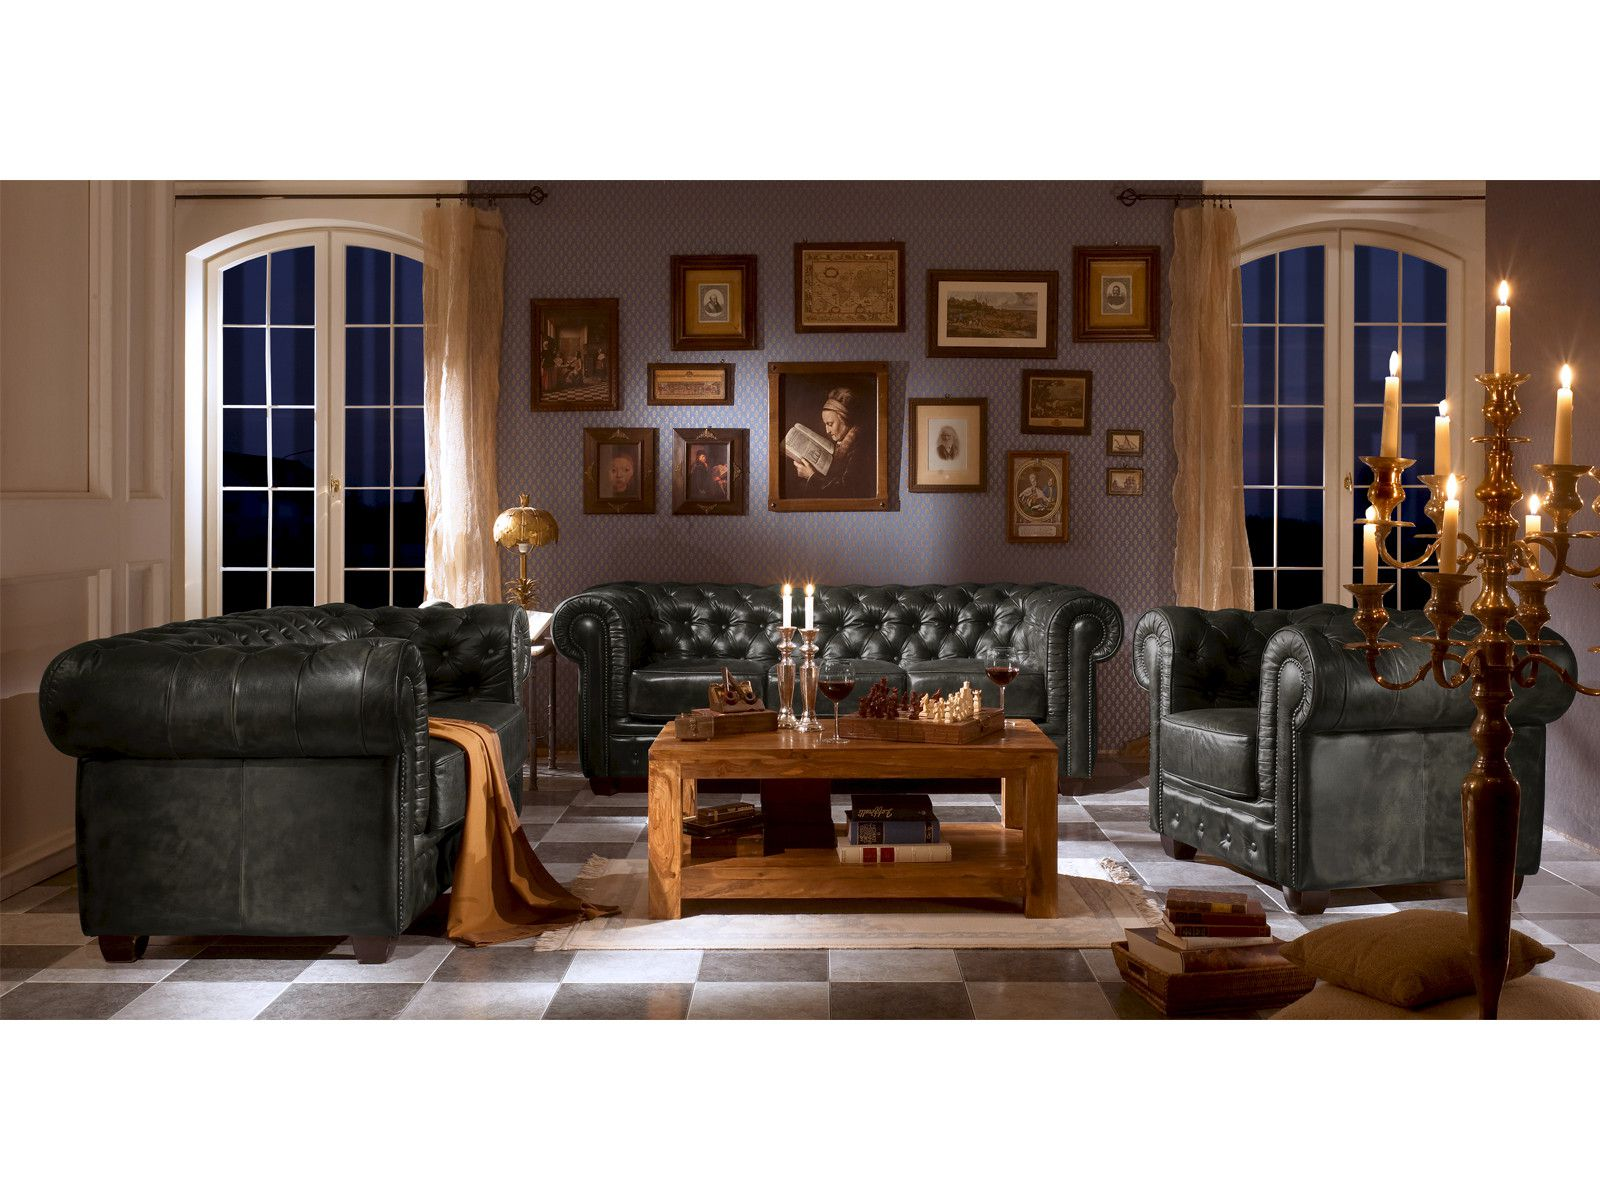 Full Size of Sofa Garnitur 3 Teilig Echtleder Leder Sofa Garnitur 3/2/1 Eiche Massivholz Garnituren Couch 2 1 Moderne Gebraucht Chesterfield Sofagarnitur Grn Massivum Sofa Sofa Garnitur